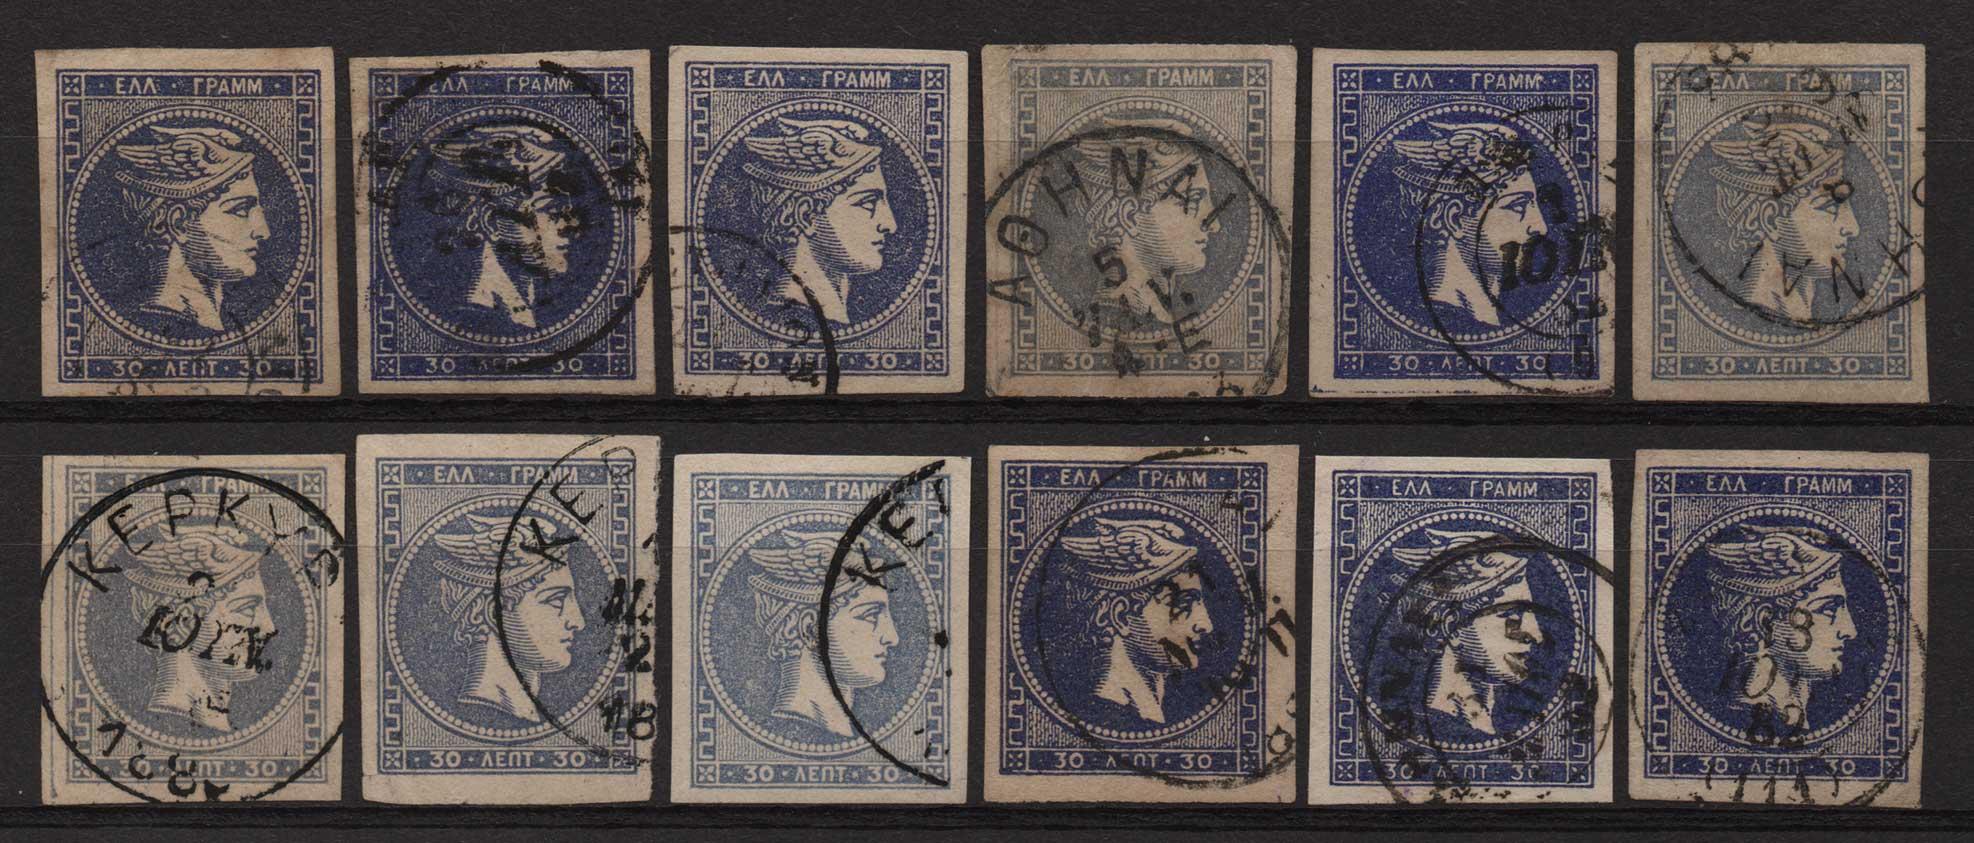 Lot 24 - GREECE-  LARGE HERMES HEAD large hermes head -  Athens Auctions Public Auction 63 General Stamp Sale